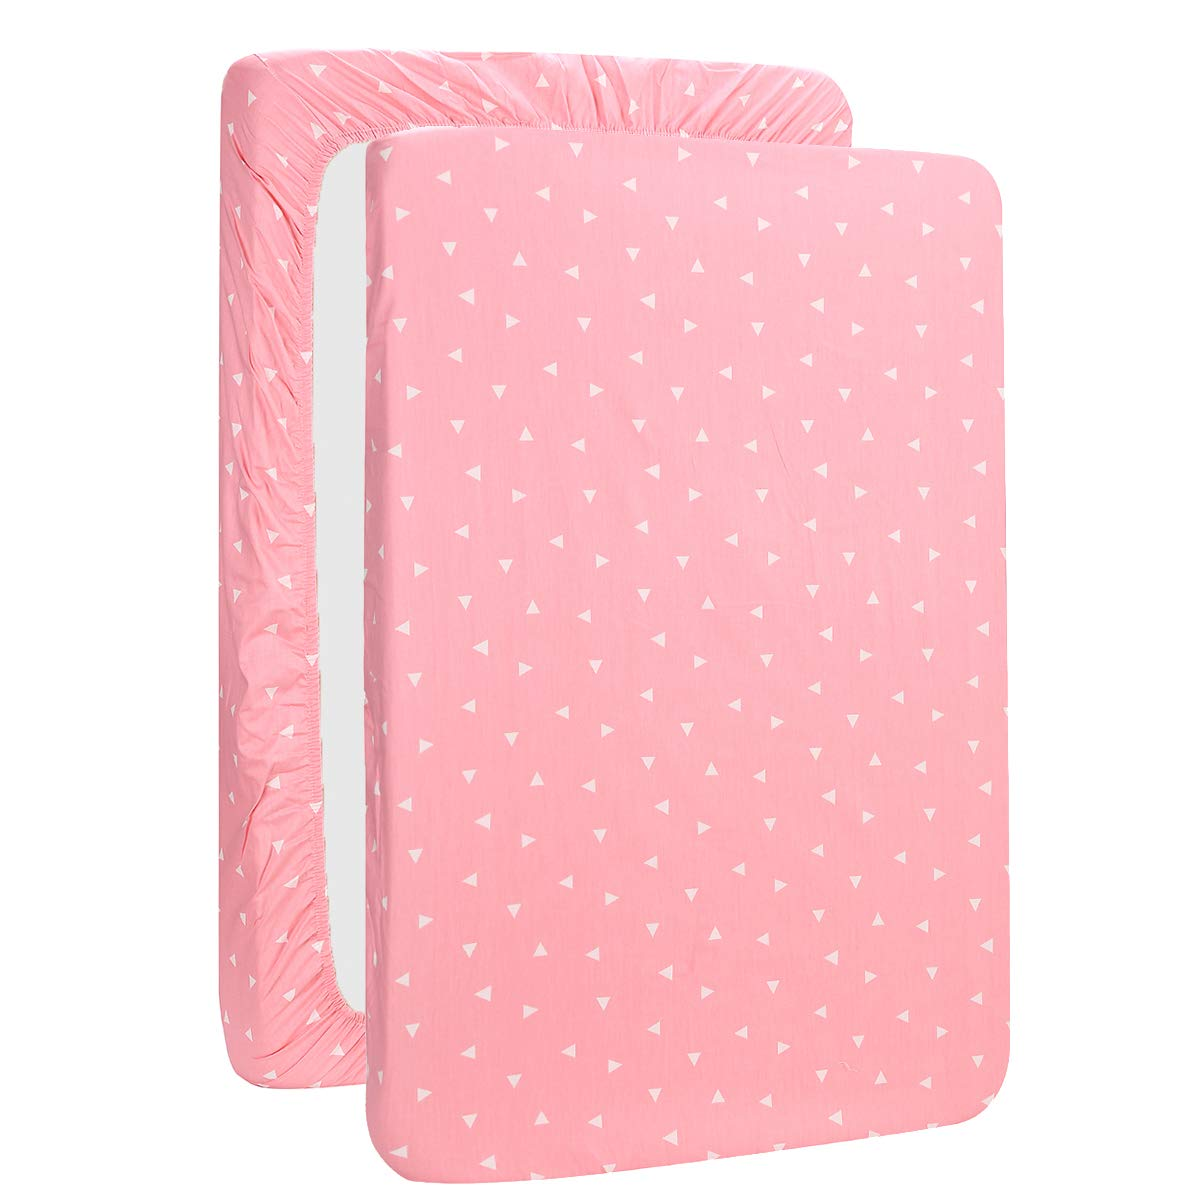 UOMNY Mini Crib Sheets Pink Triangle Pack n Play Playard Sheet Fitted Playard Mattress Sheet,100% Natural Cotton Mini Portable Crib Sheets for Boys and Girls 1 Pack